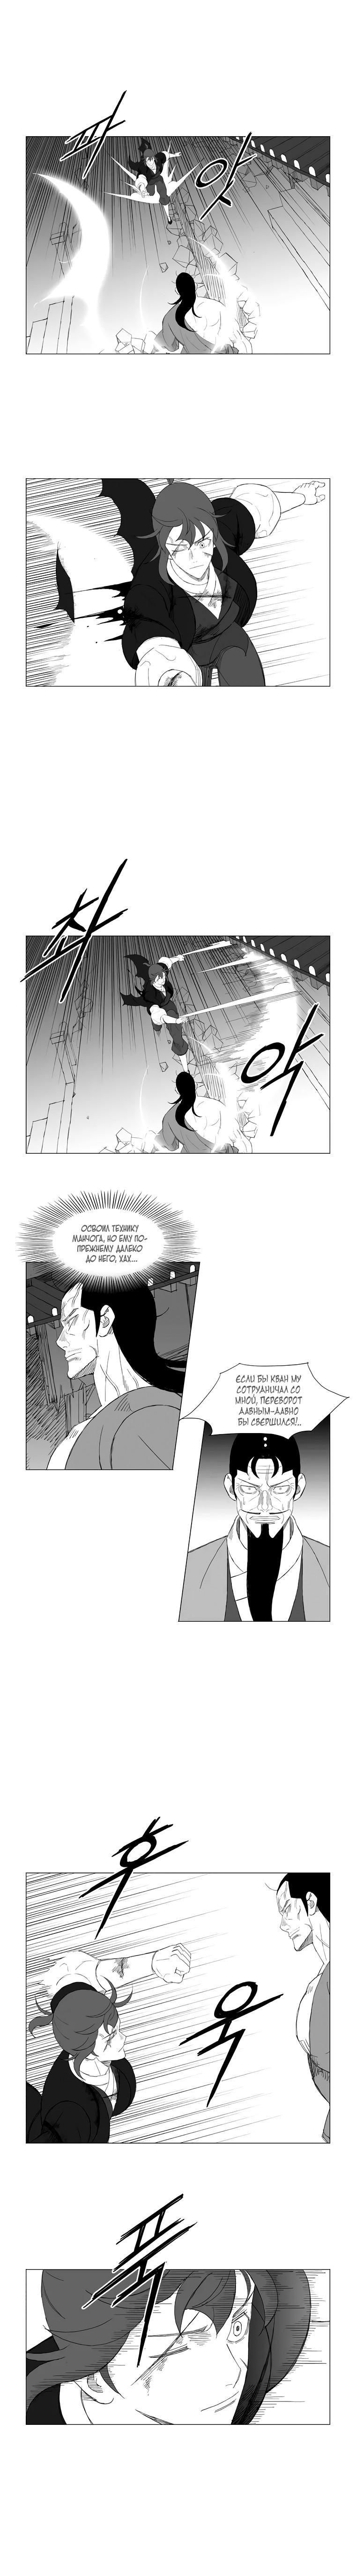 https://r1.ninemanga.com/comics/pic3/39/28263/1275882/1542235217248.jpg Page 3